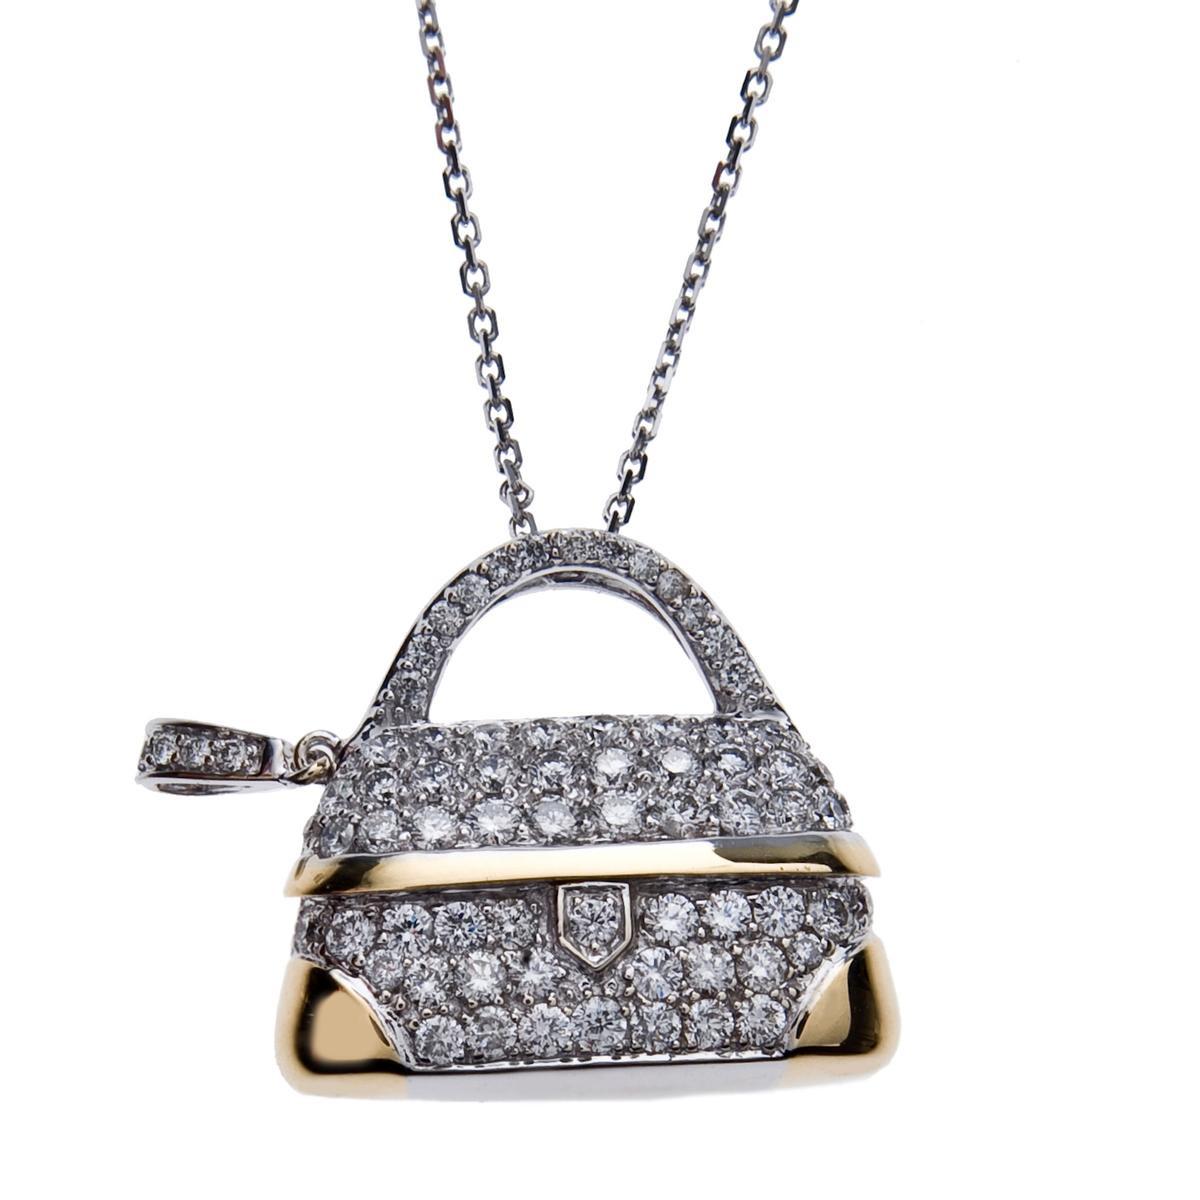 Vintage Mirabelle 1.24 CTW Diamond Purse Charm